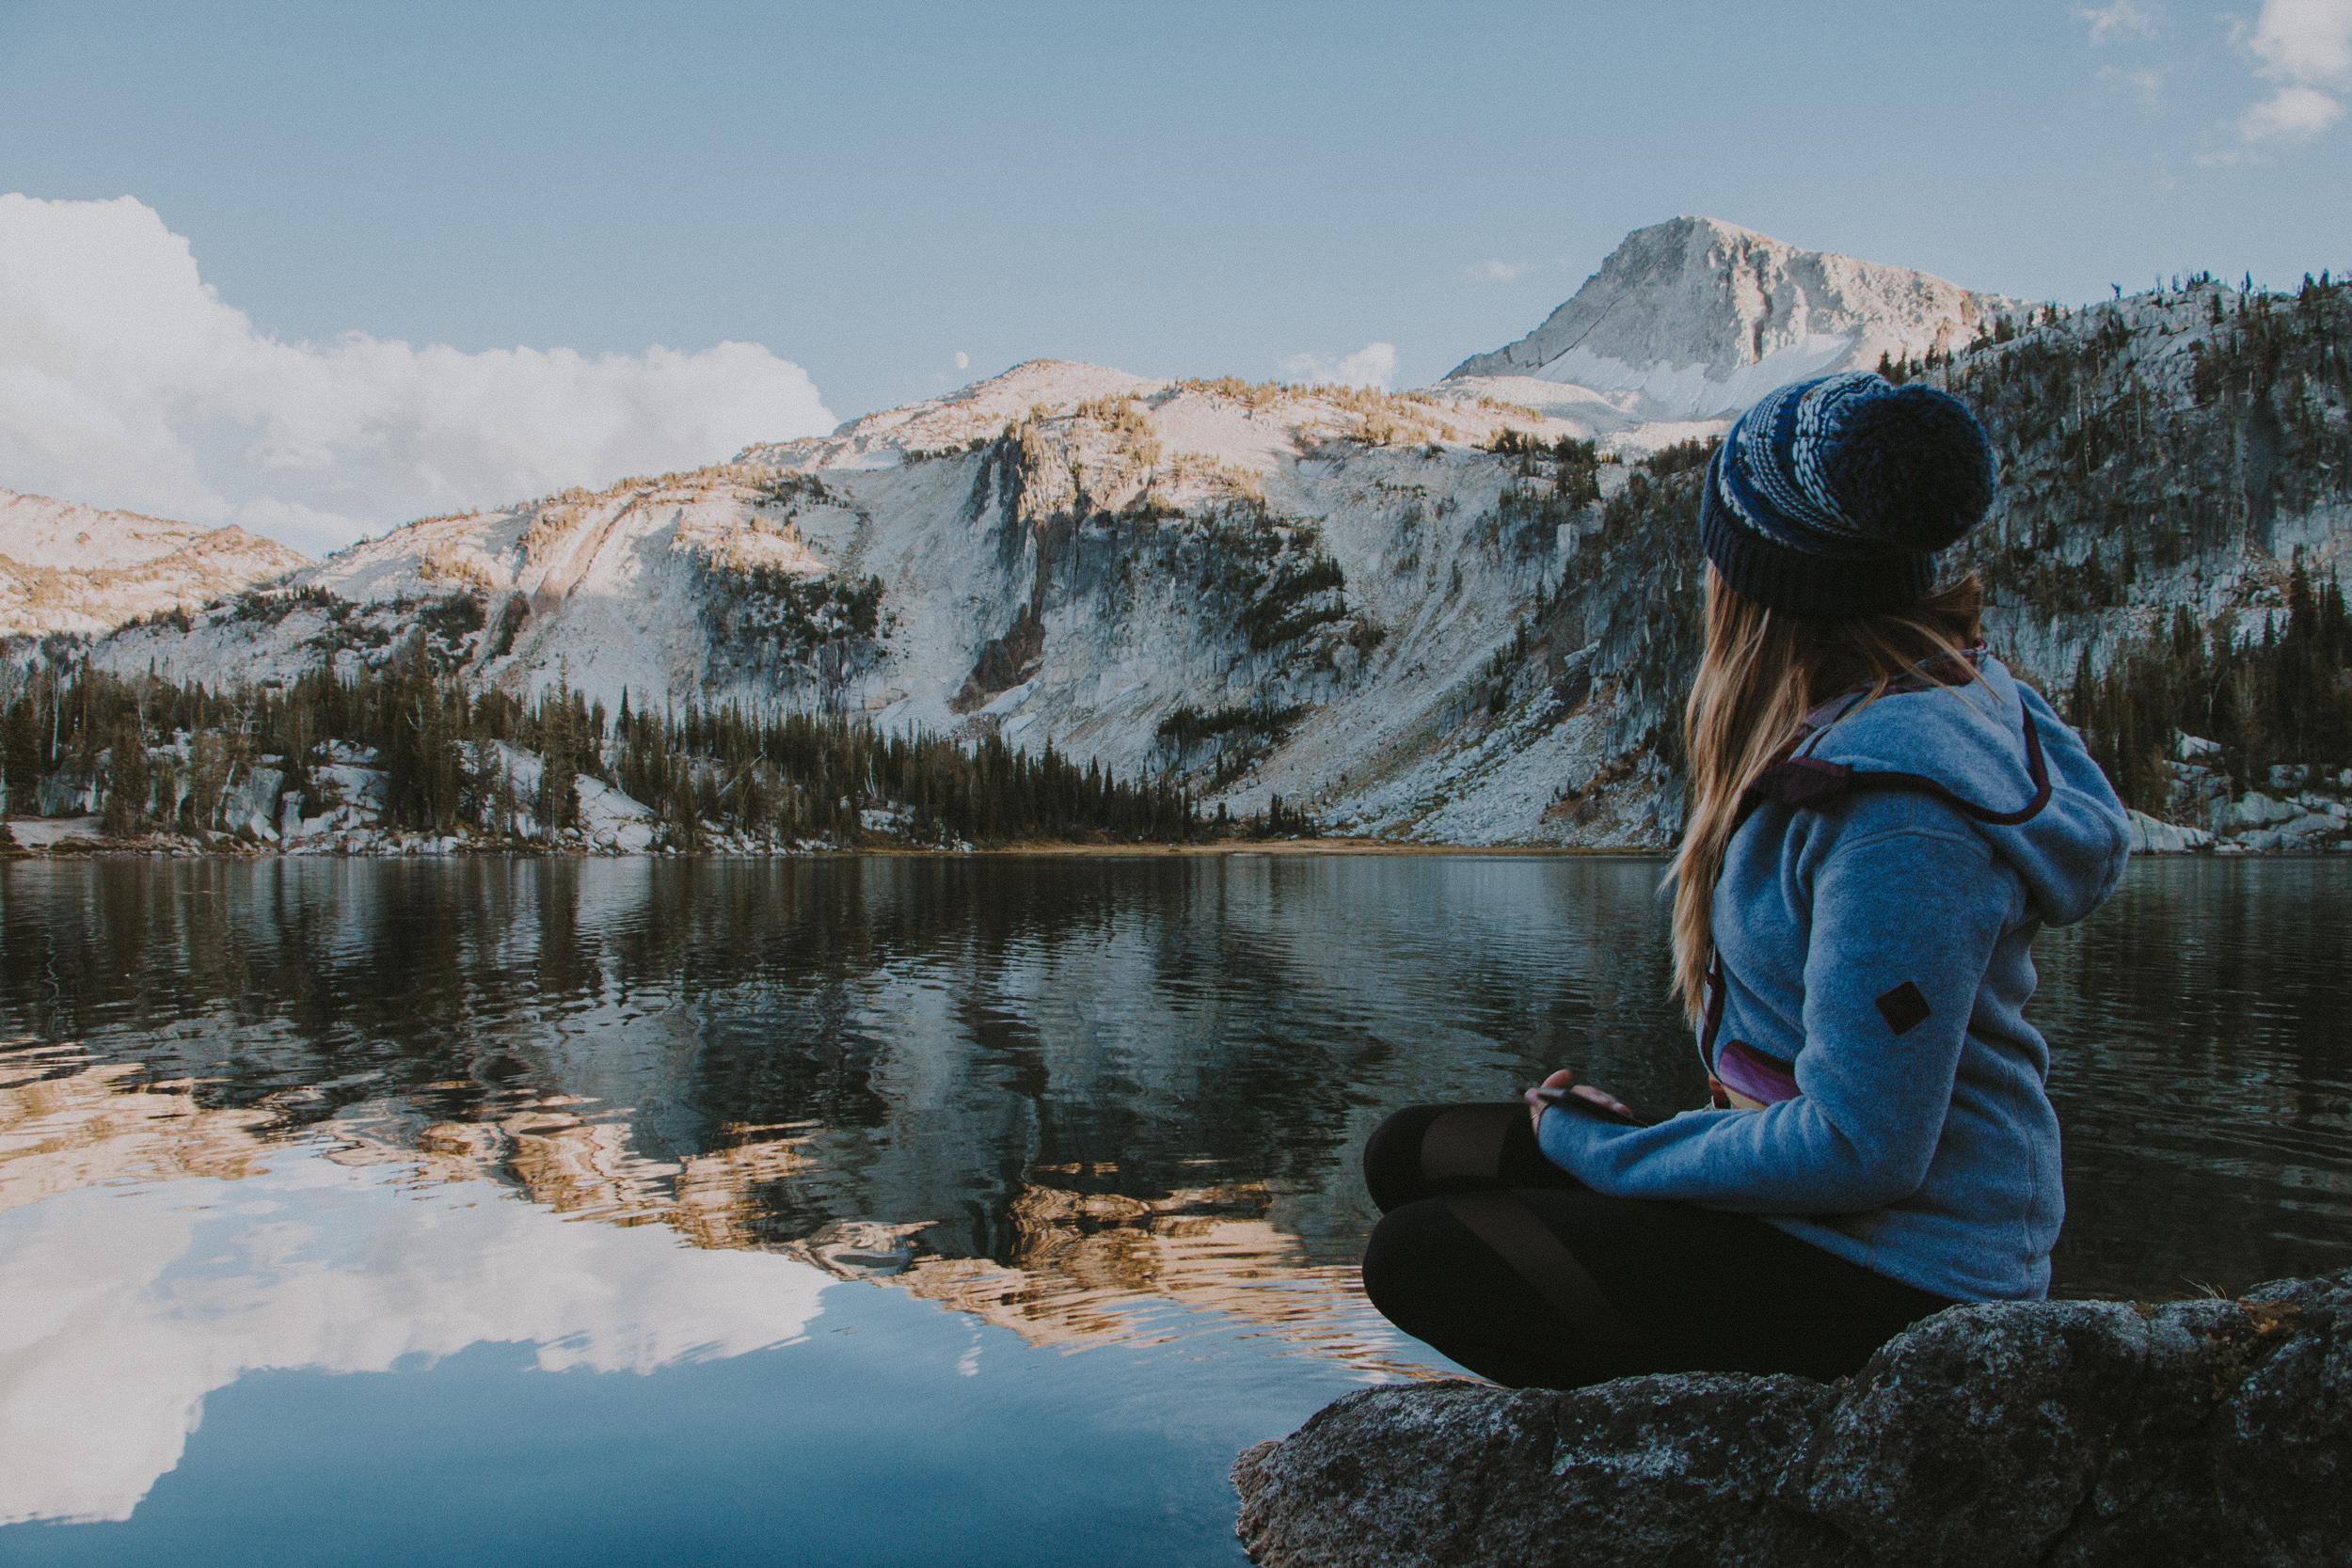 wallowas-backpacking-trip-2018-0351.jpg